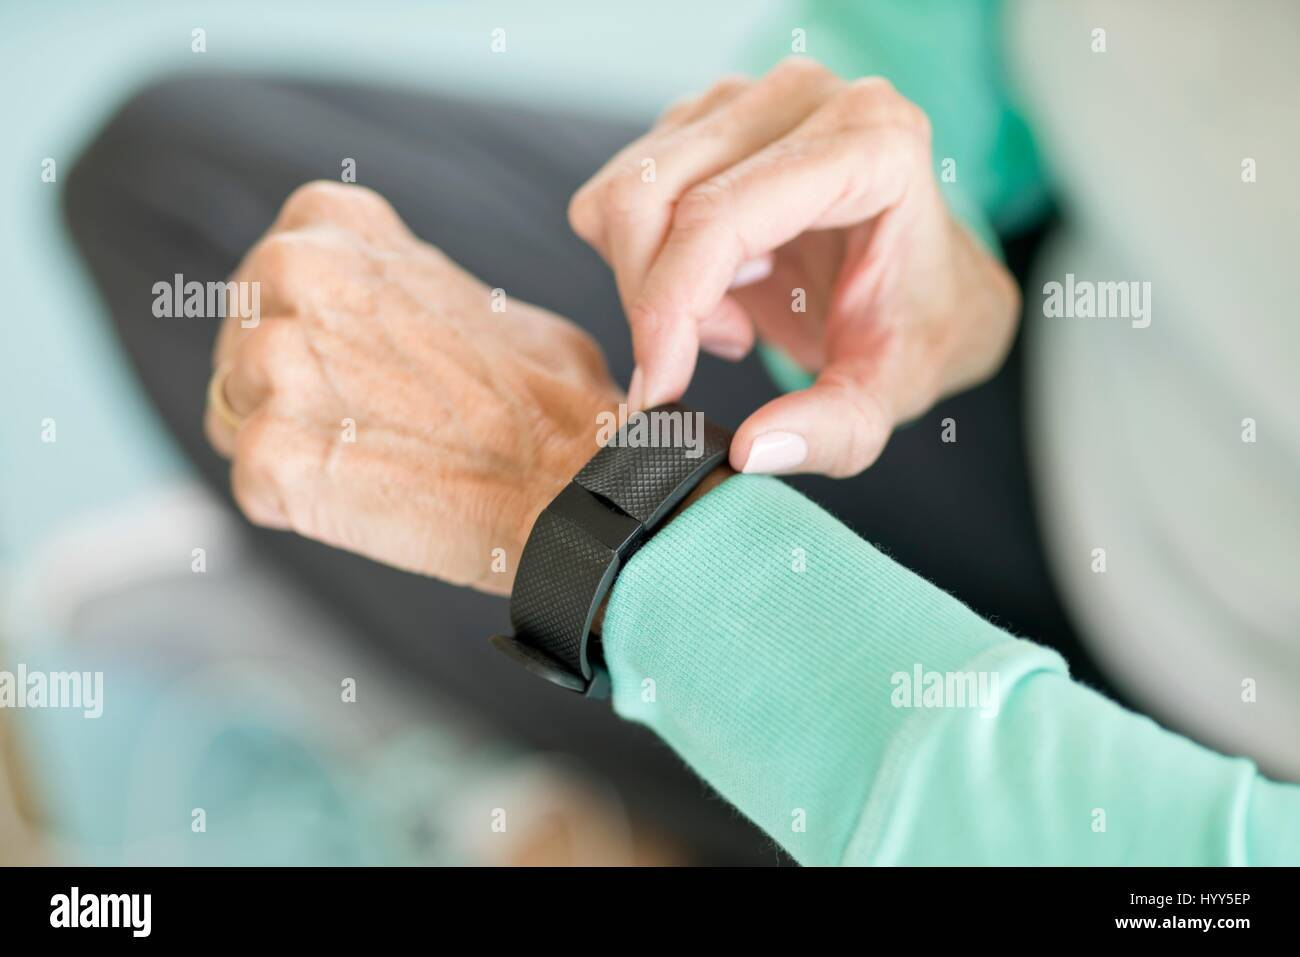 Senior woman using fitness tracker on wrist. - Stock Image